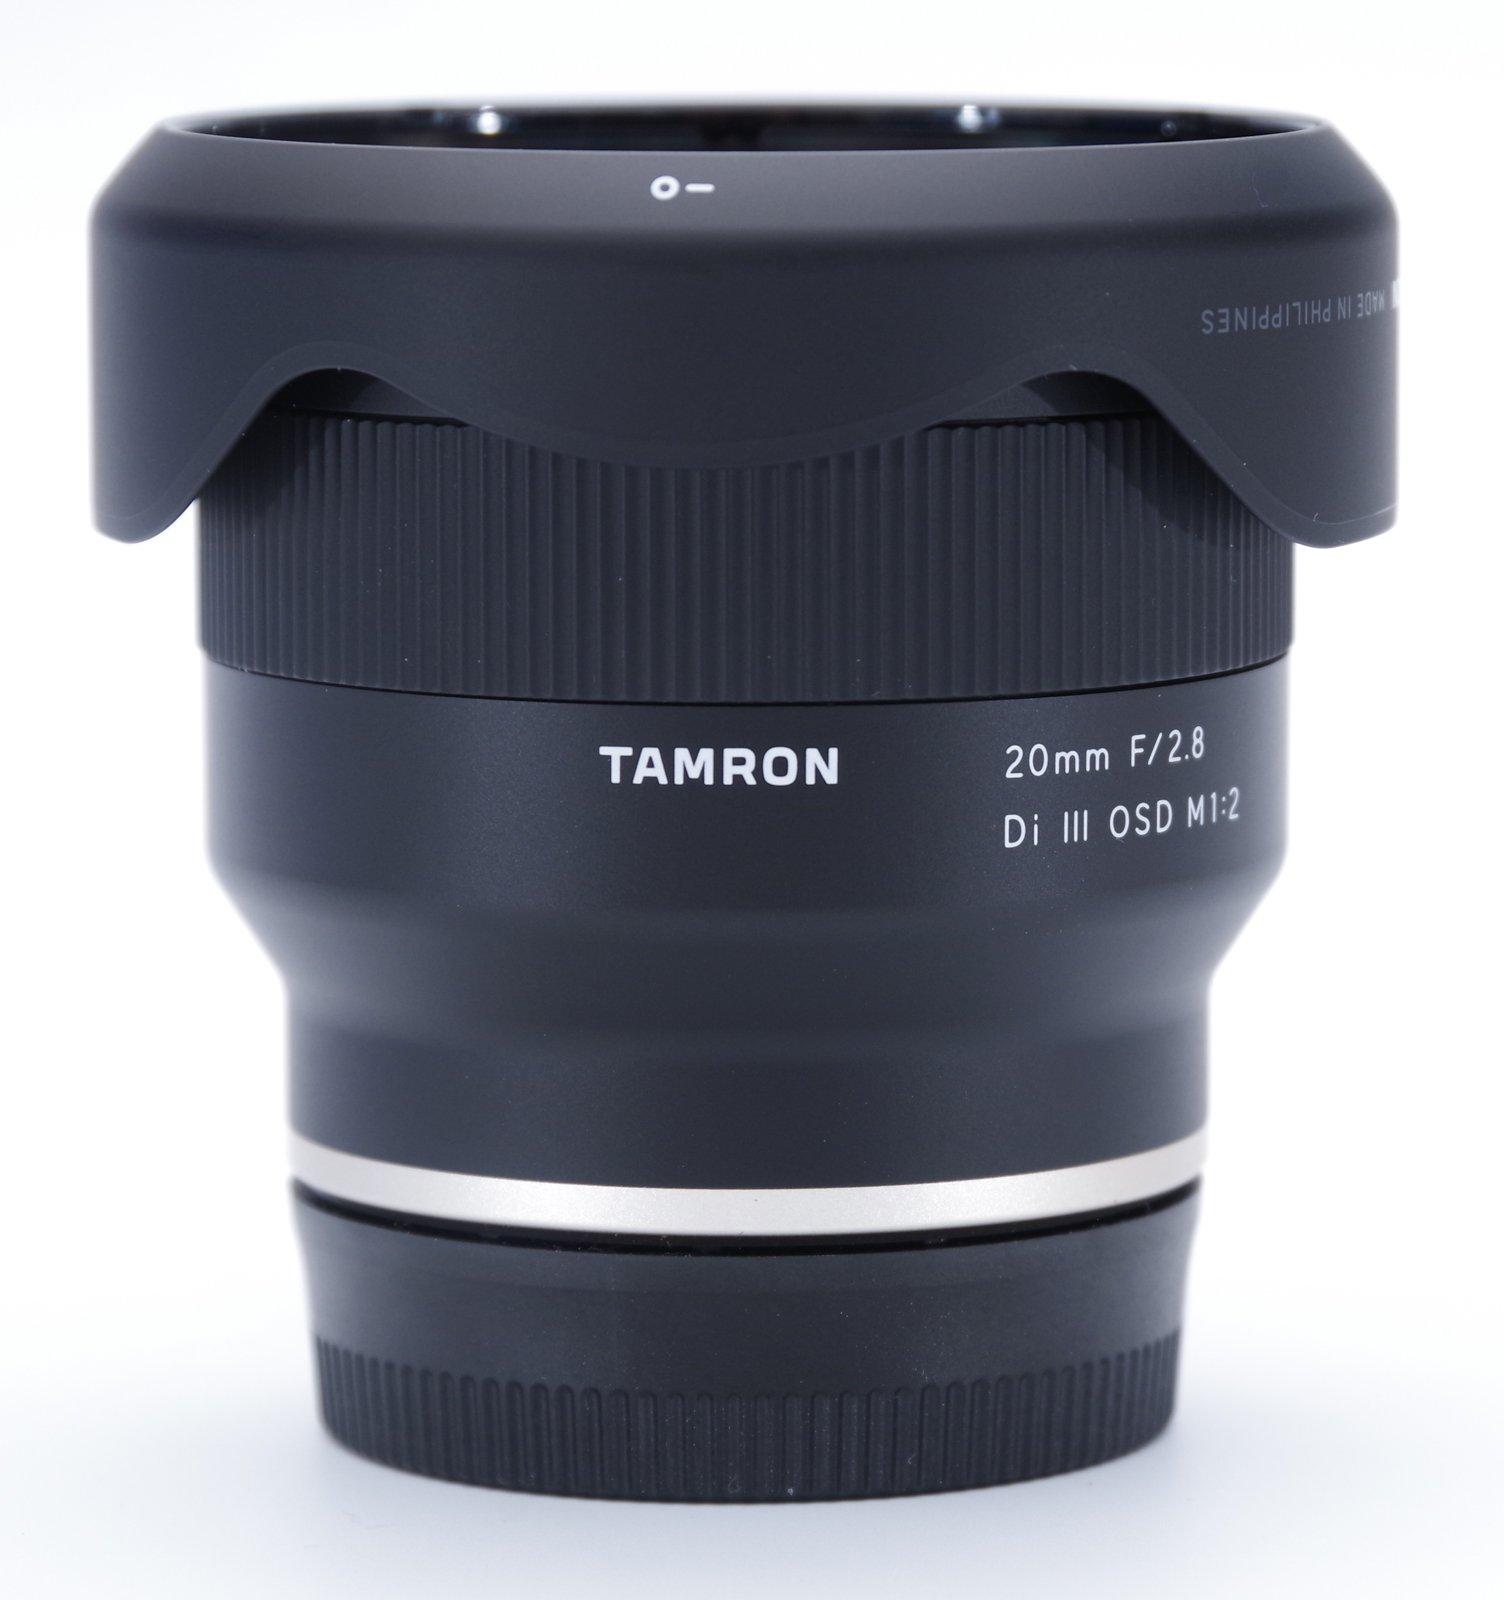 Tamron 20mm F2.8 Lens Hood